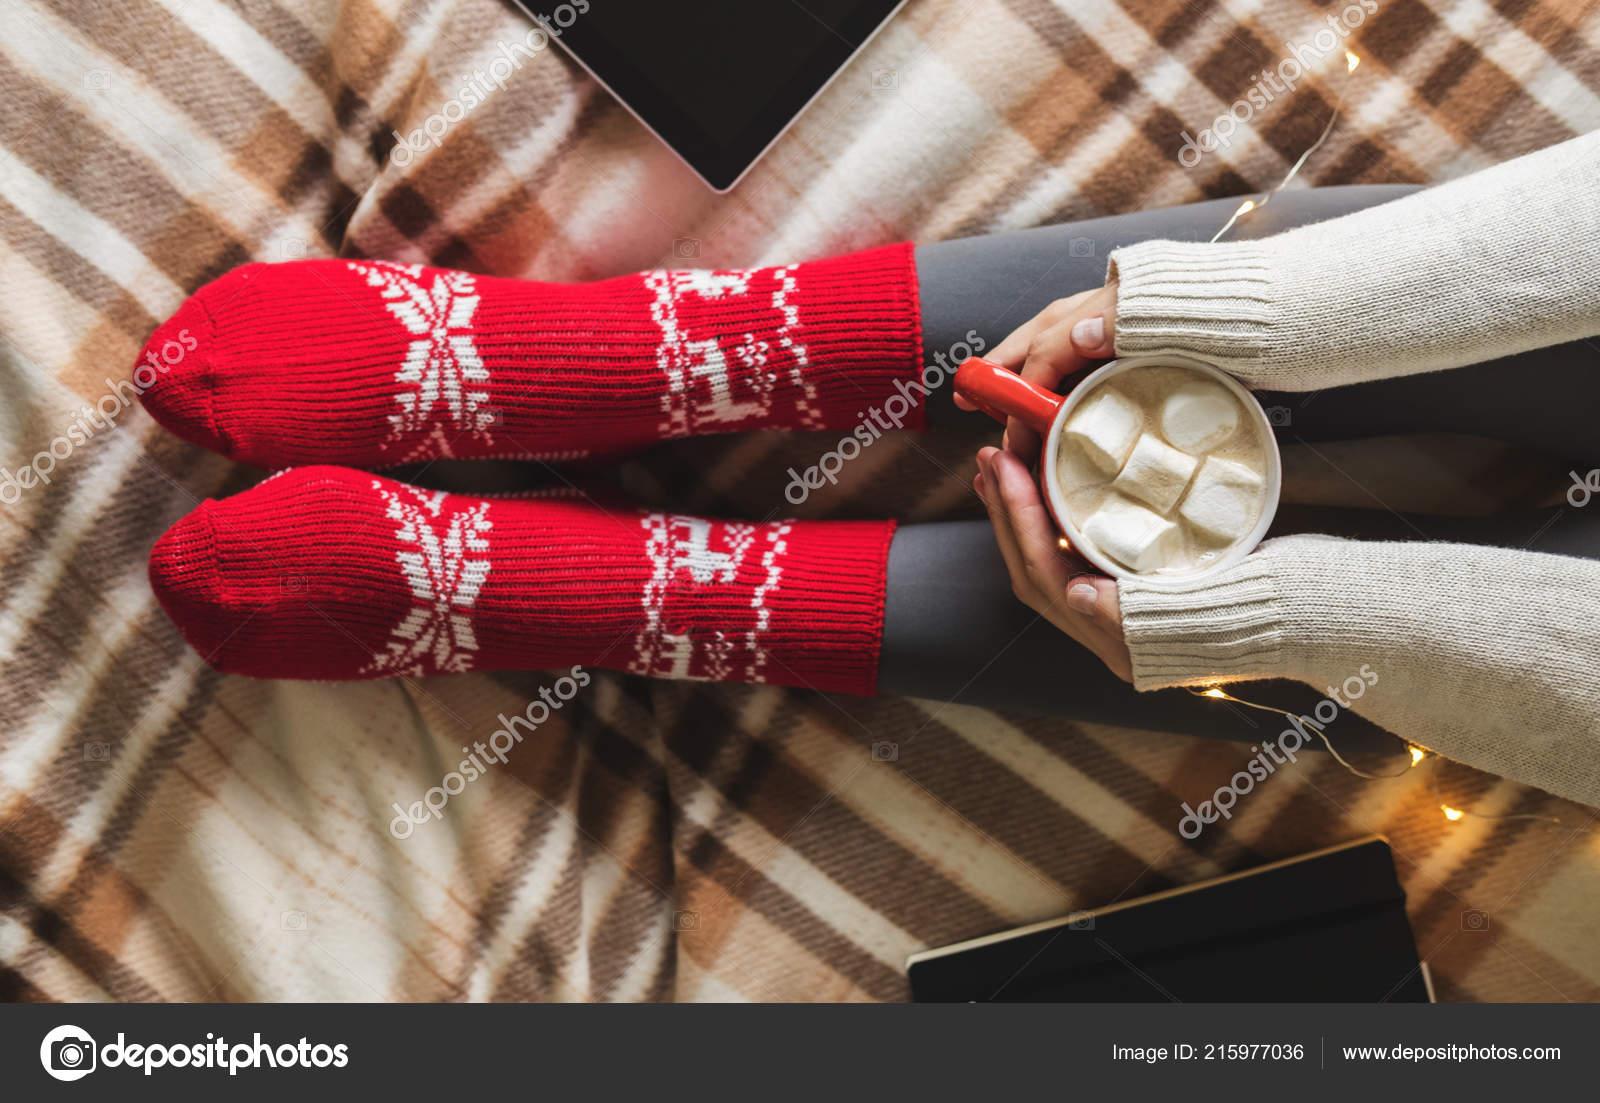 be439f842434 Γυναικεία χέρια και τα πόδια σε πουλόβερ και μάλλινων ζεστό κόκκινο κάλτσες  εκμετάλλευση ζεστό φλιτζάνι καφέ με το marshmallow